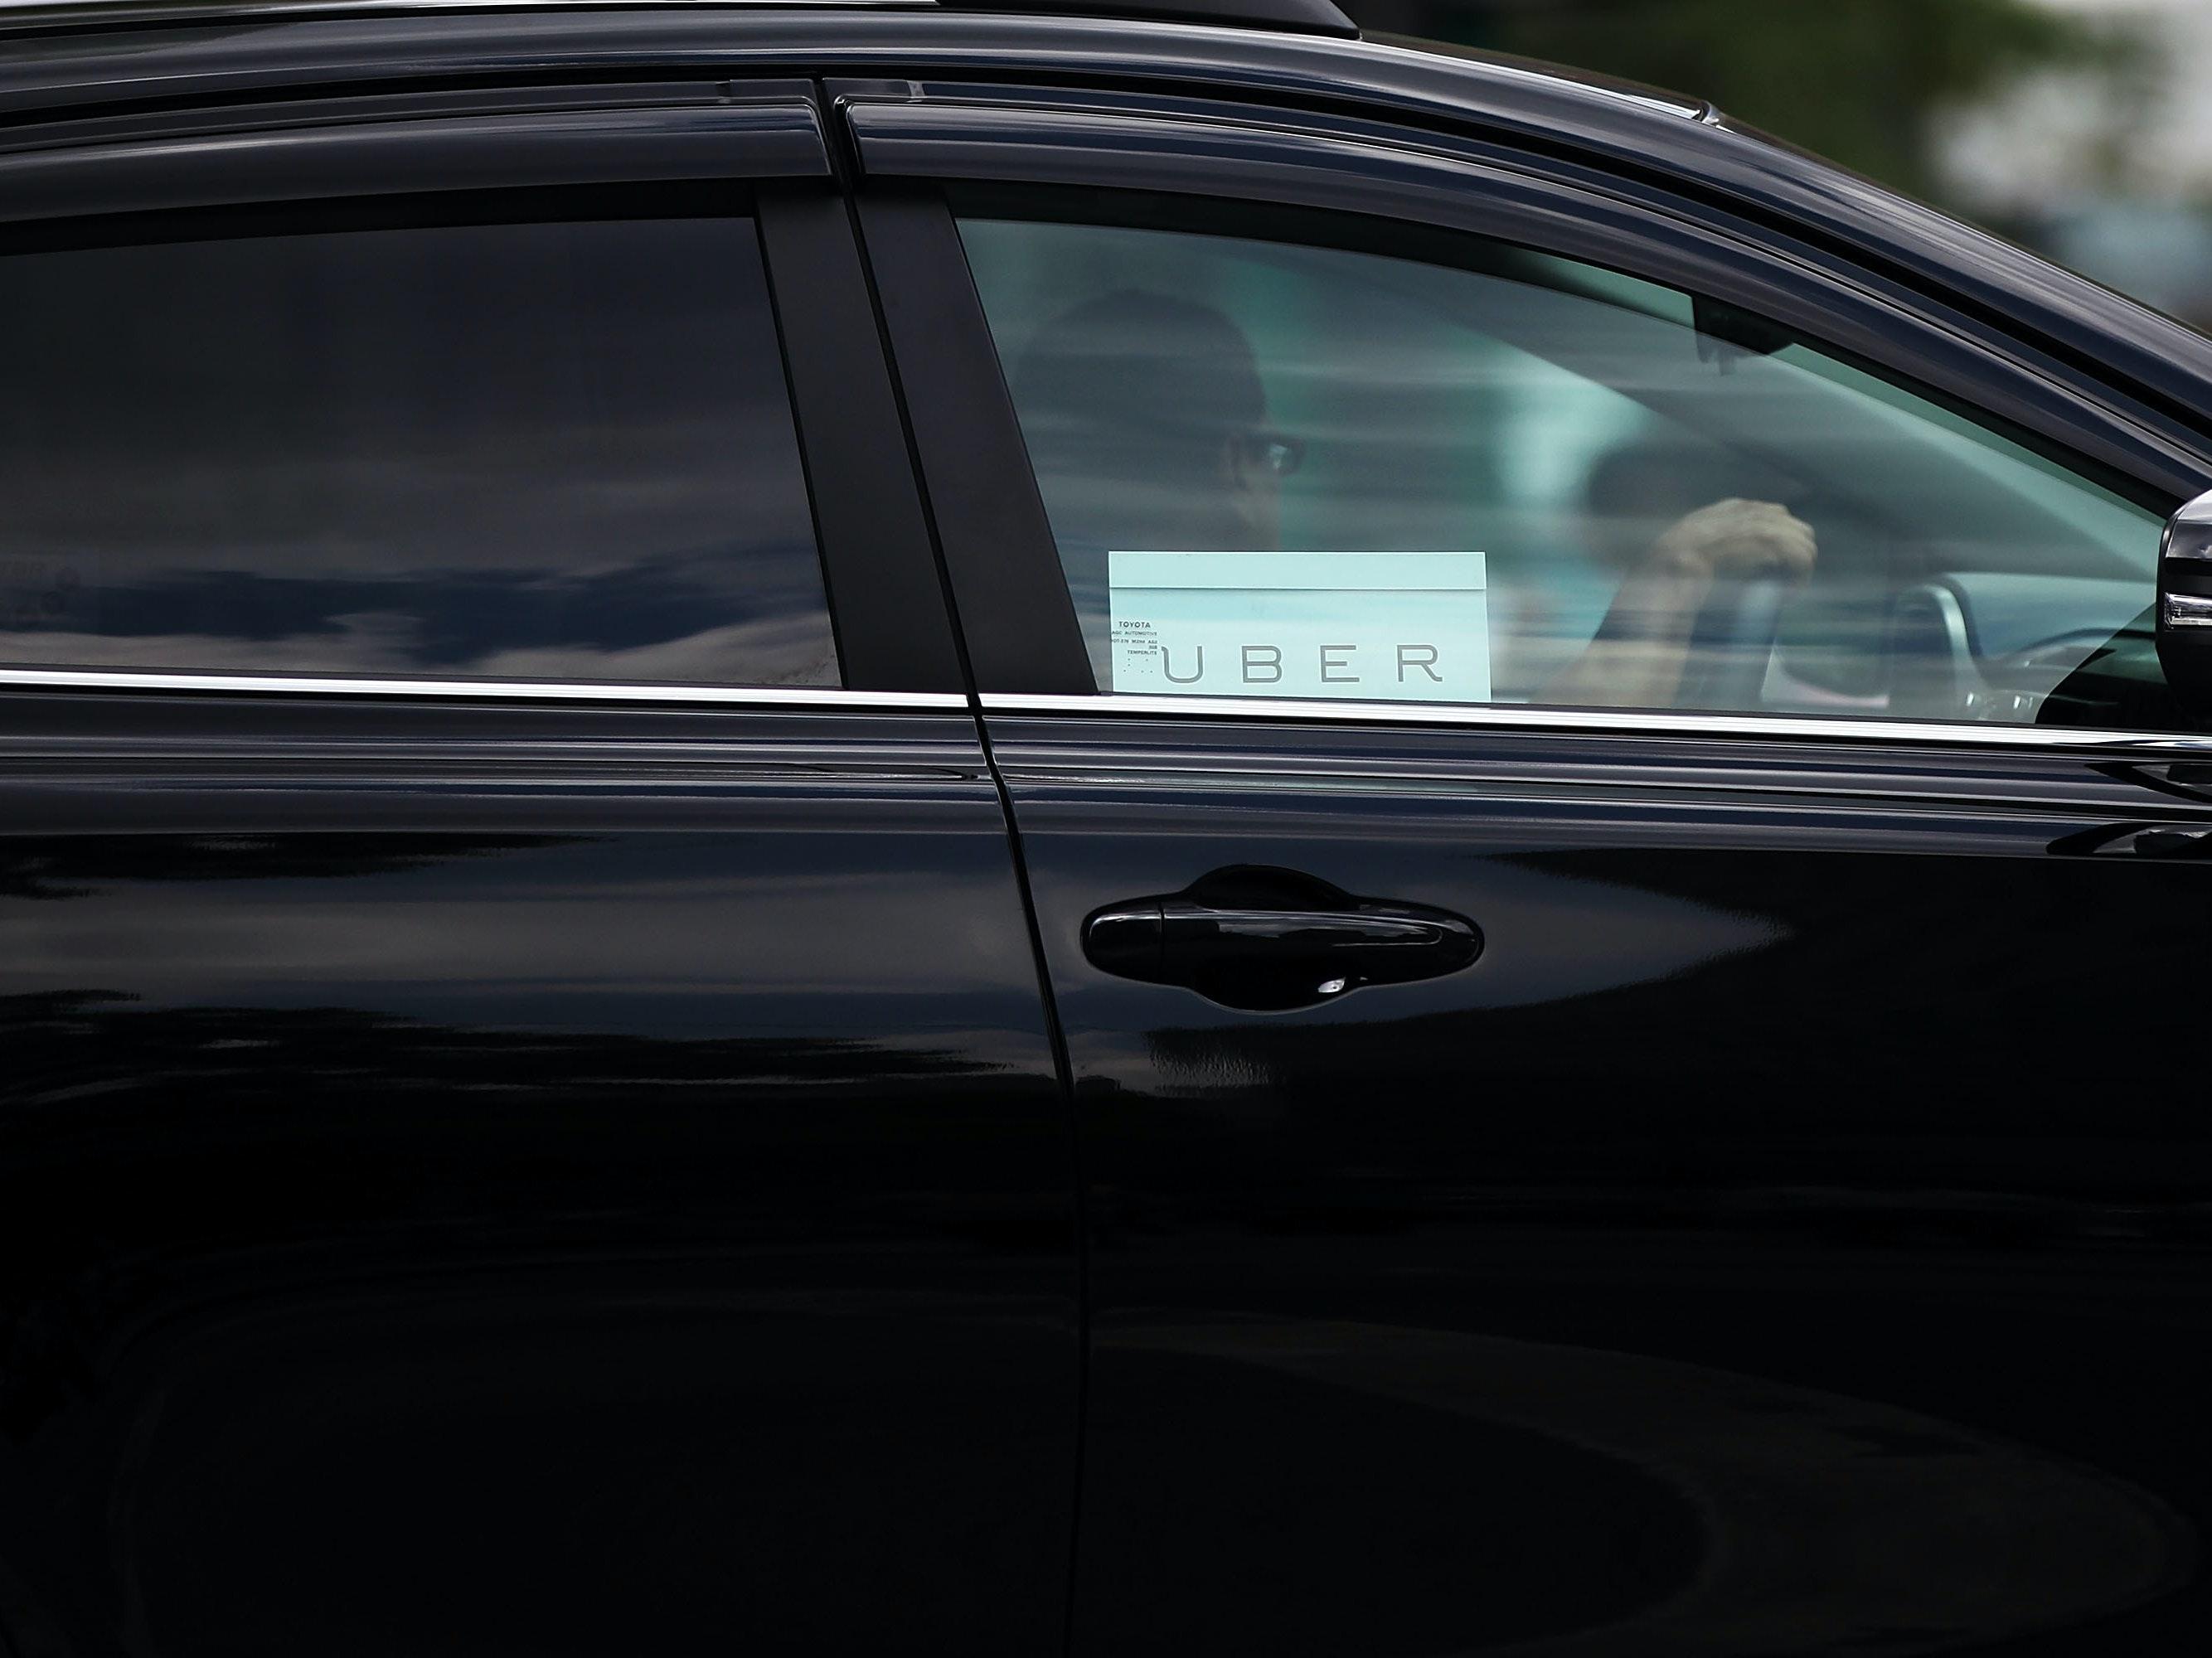 Autonomy Could Make the Uber Sedan a Rare Beast